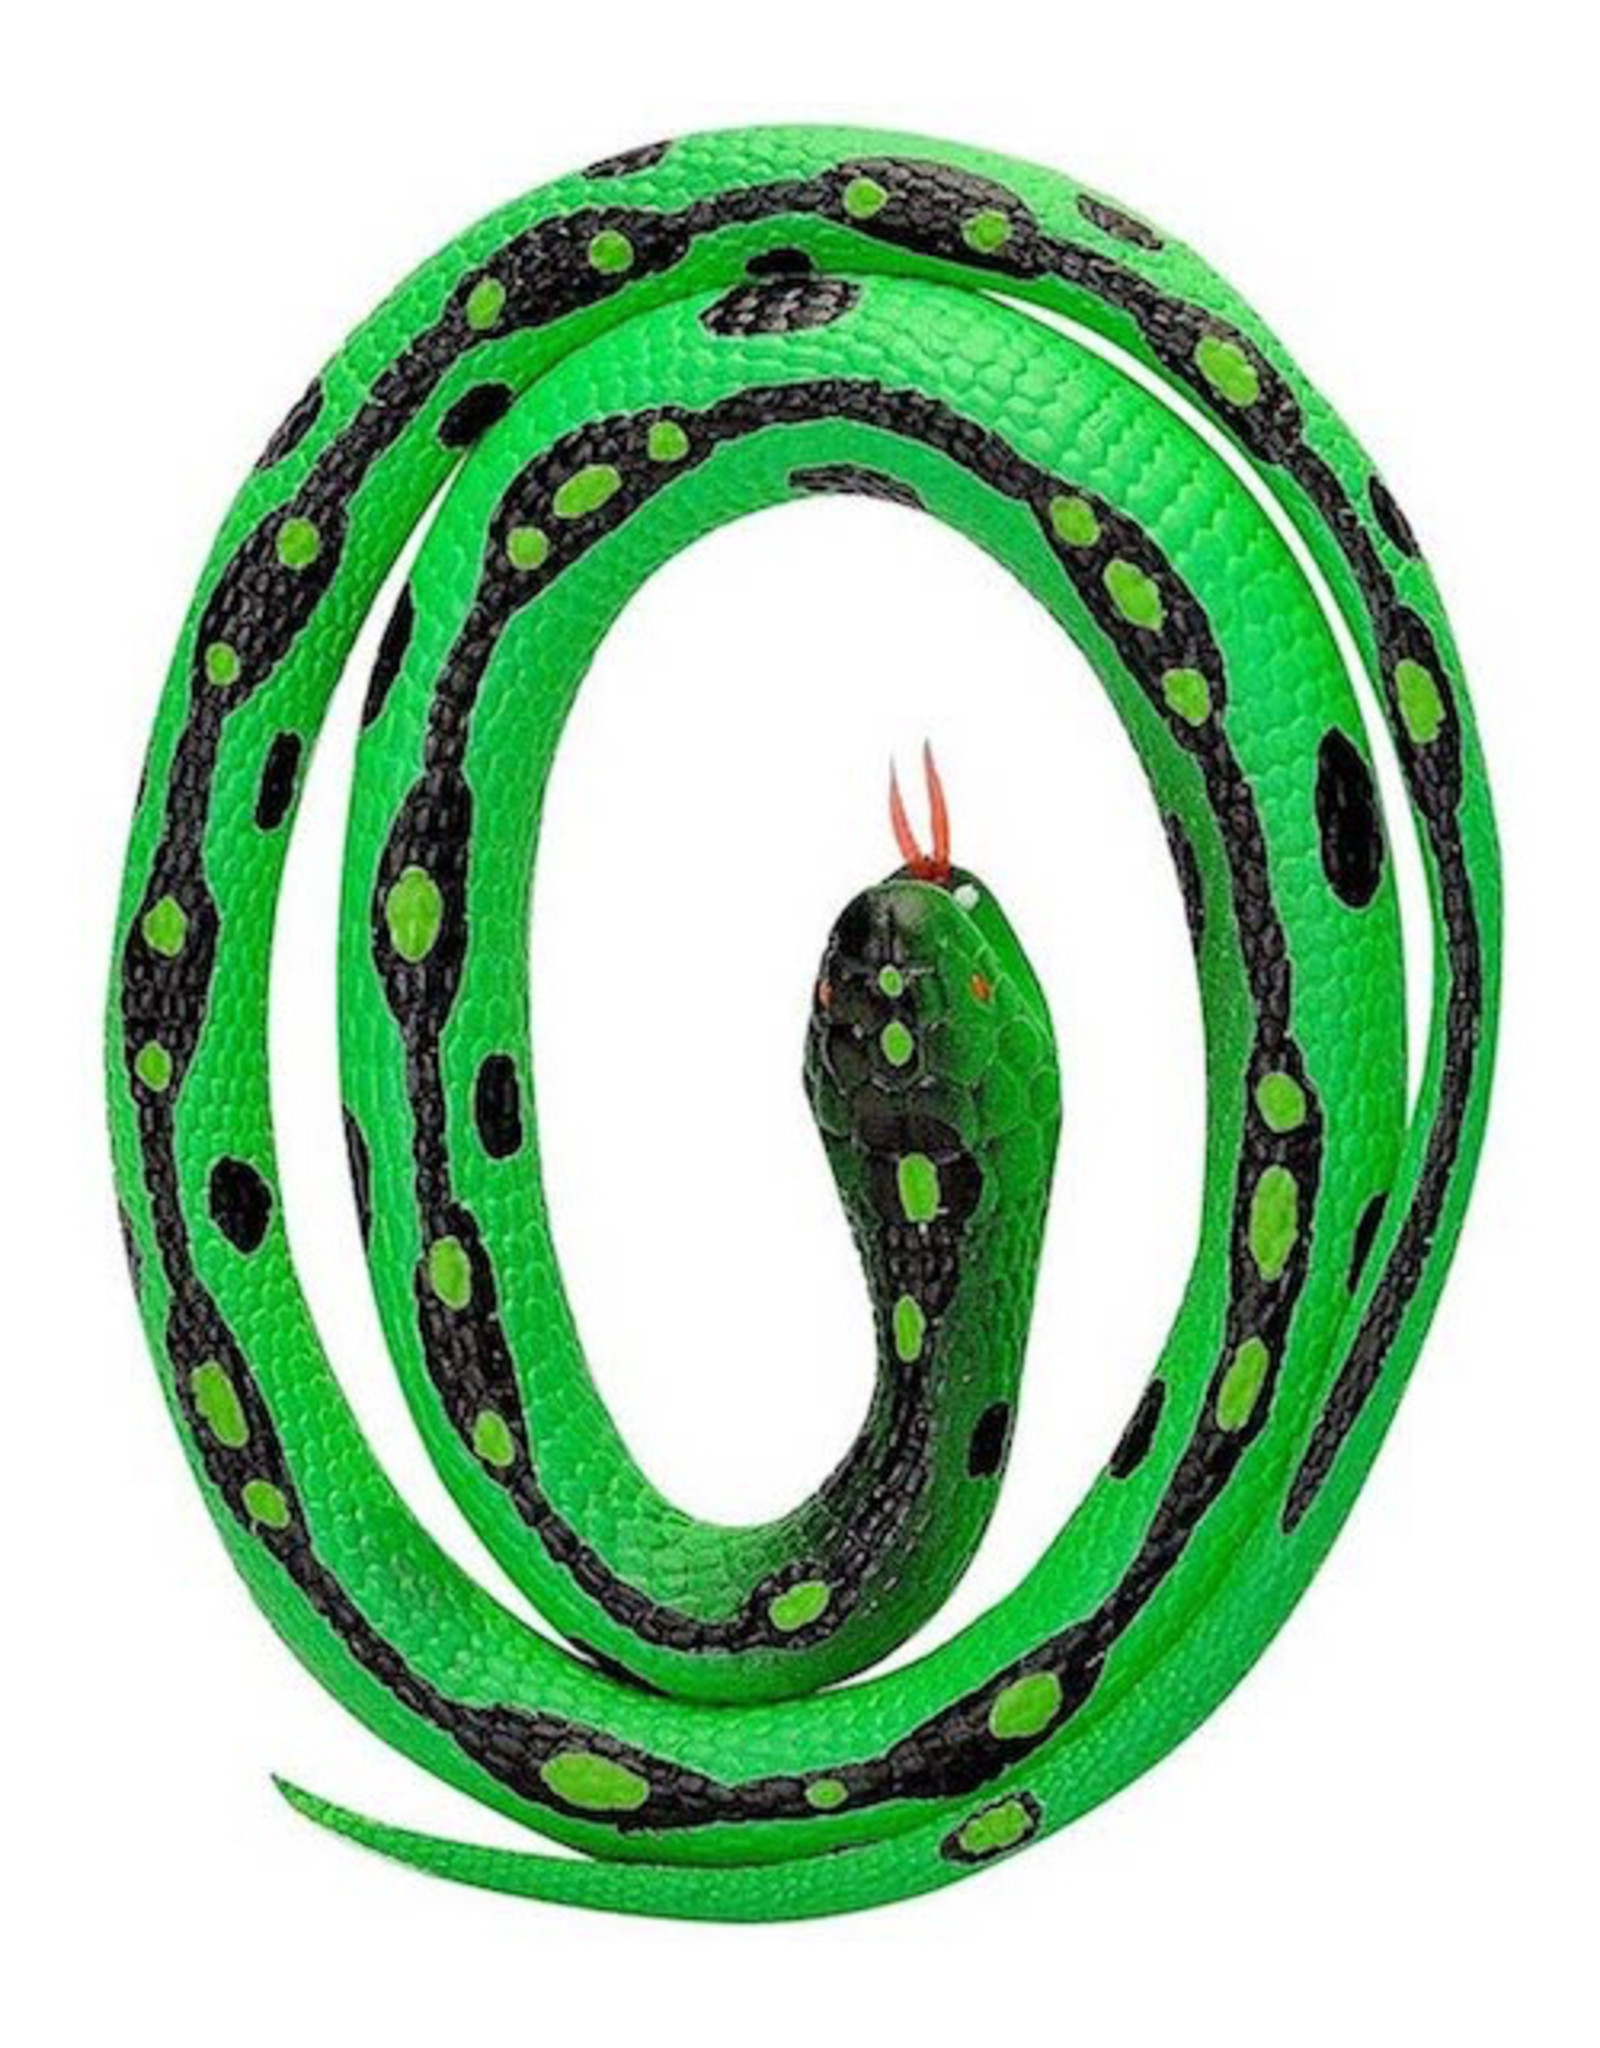 RUBBER SNAKE SMALL GREEN GARTER